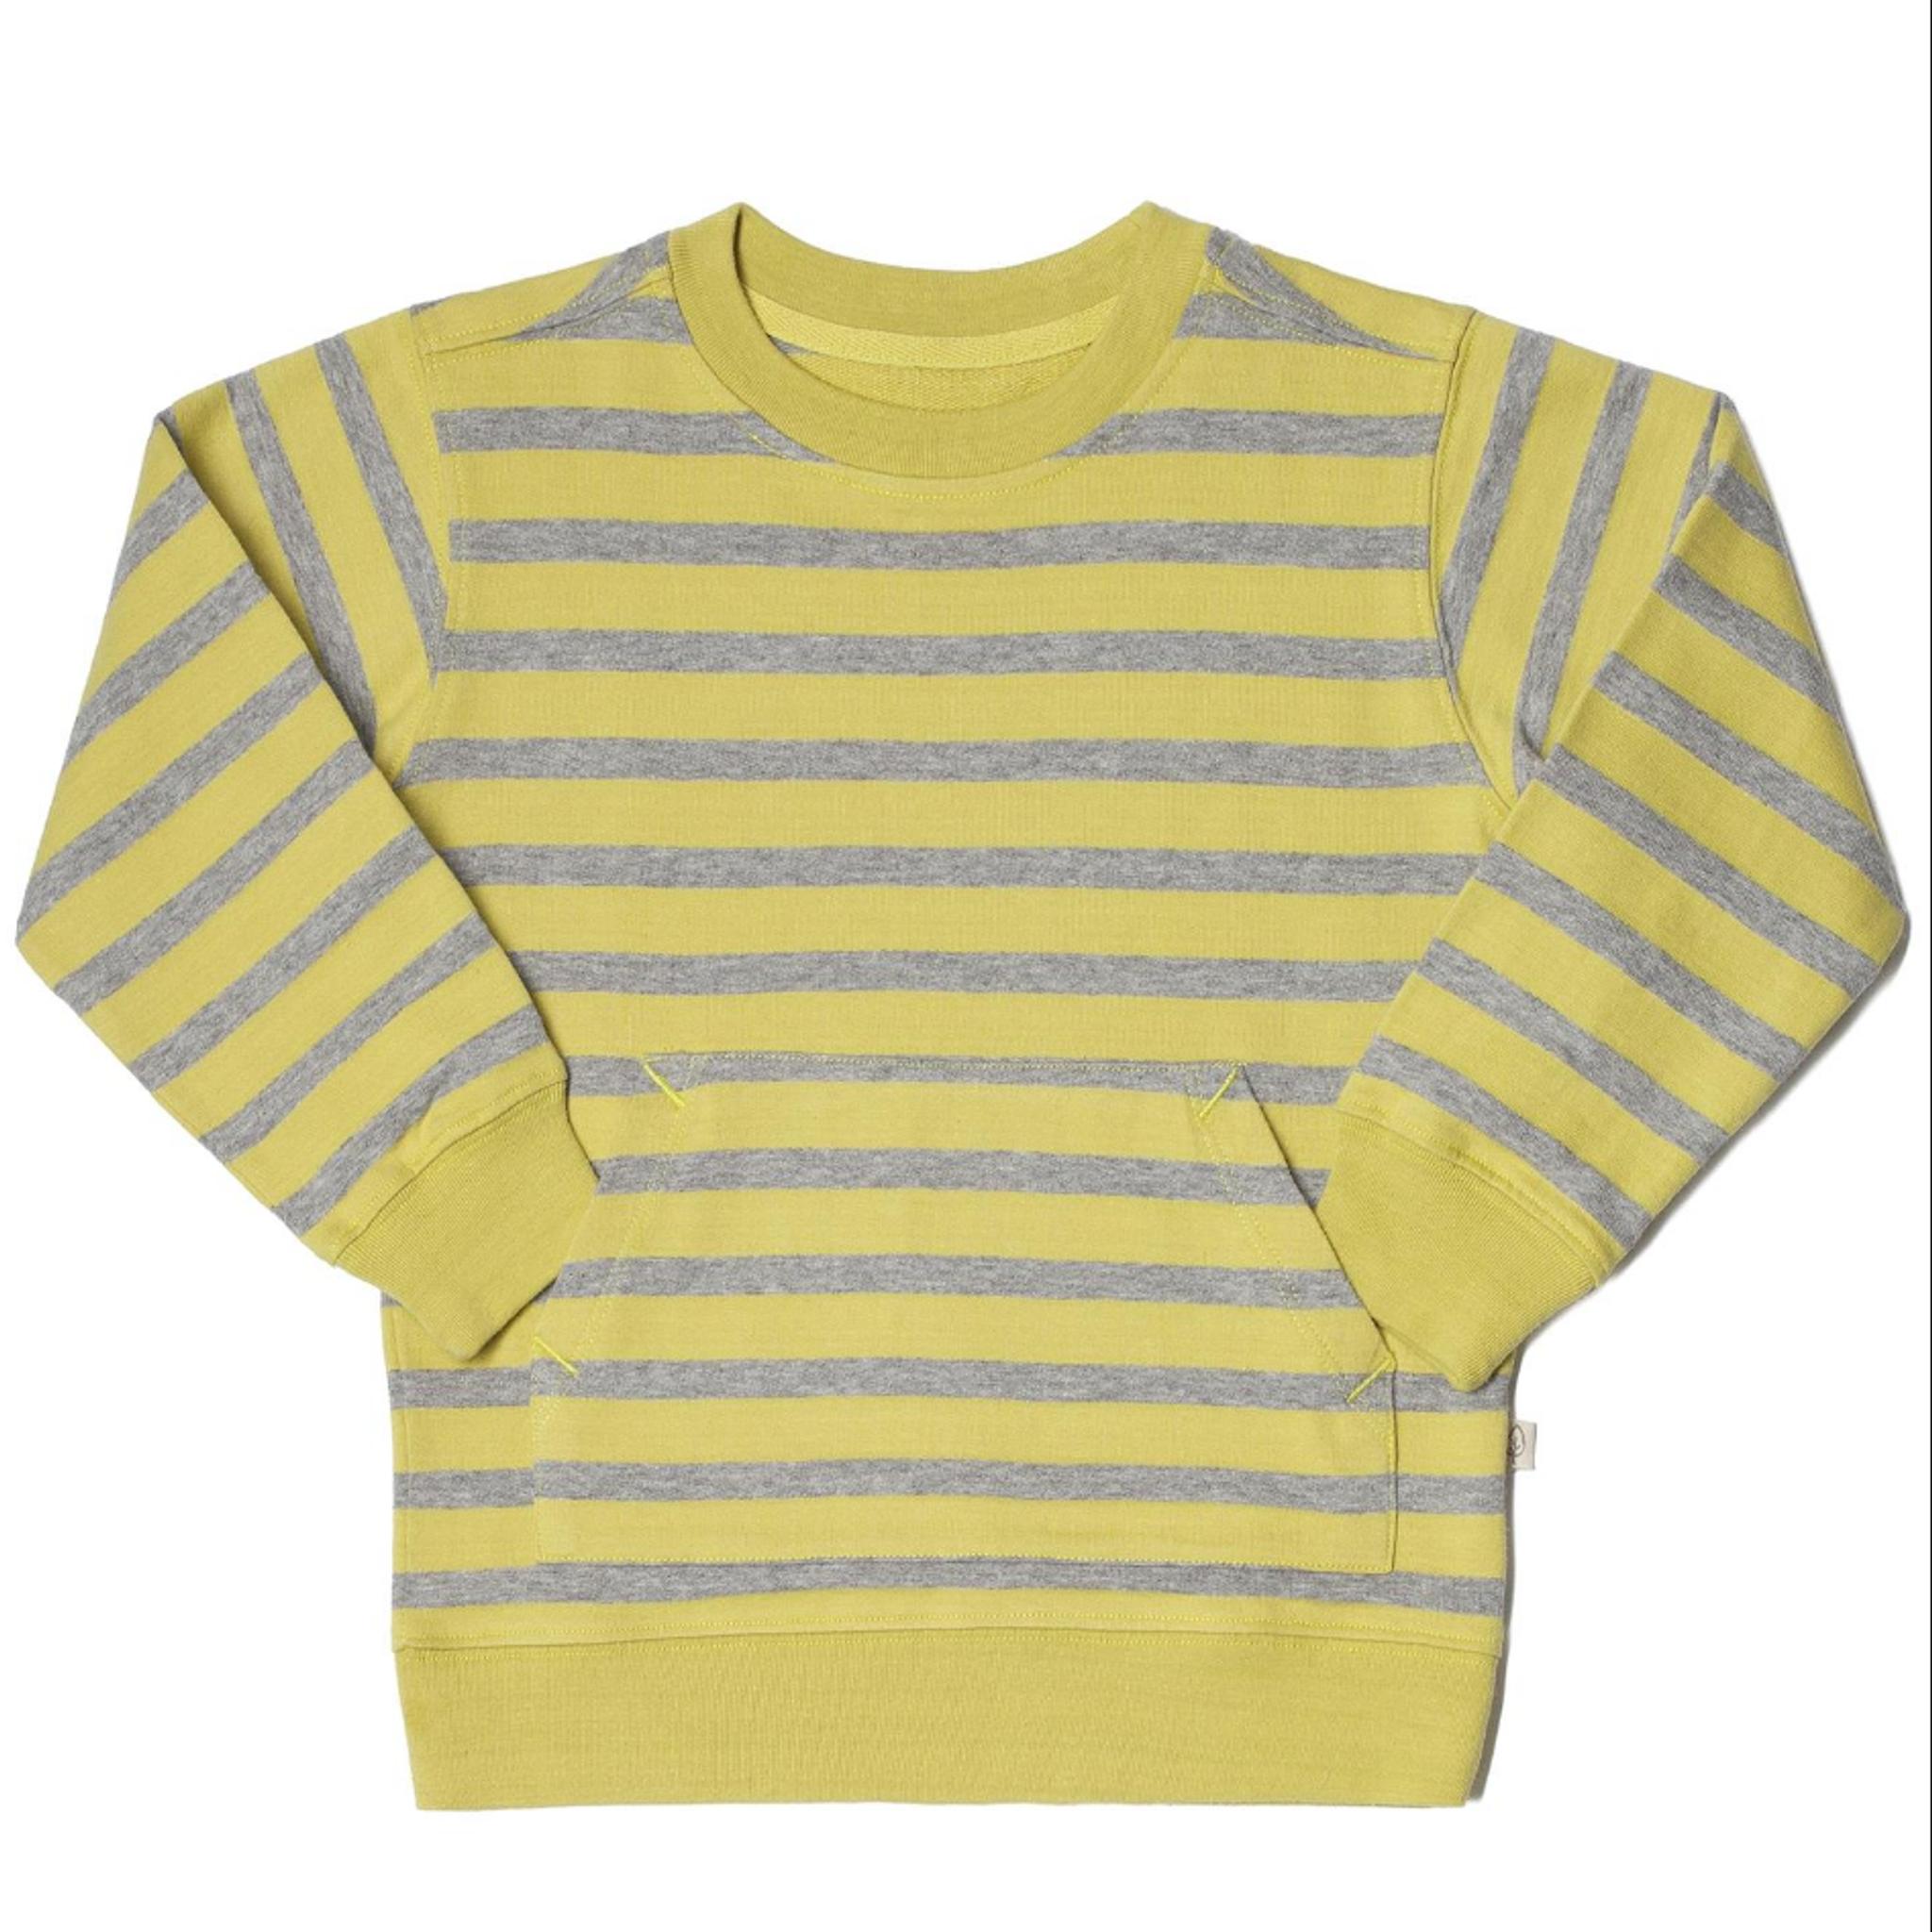 2371c99bd Kids' Organic Cotton Sweatshirt - Little Spruce Organics